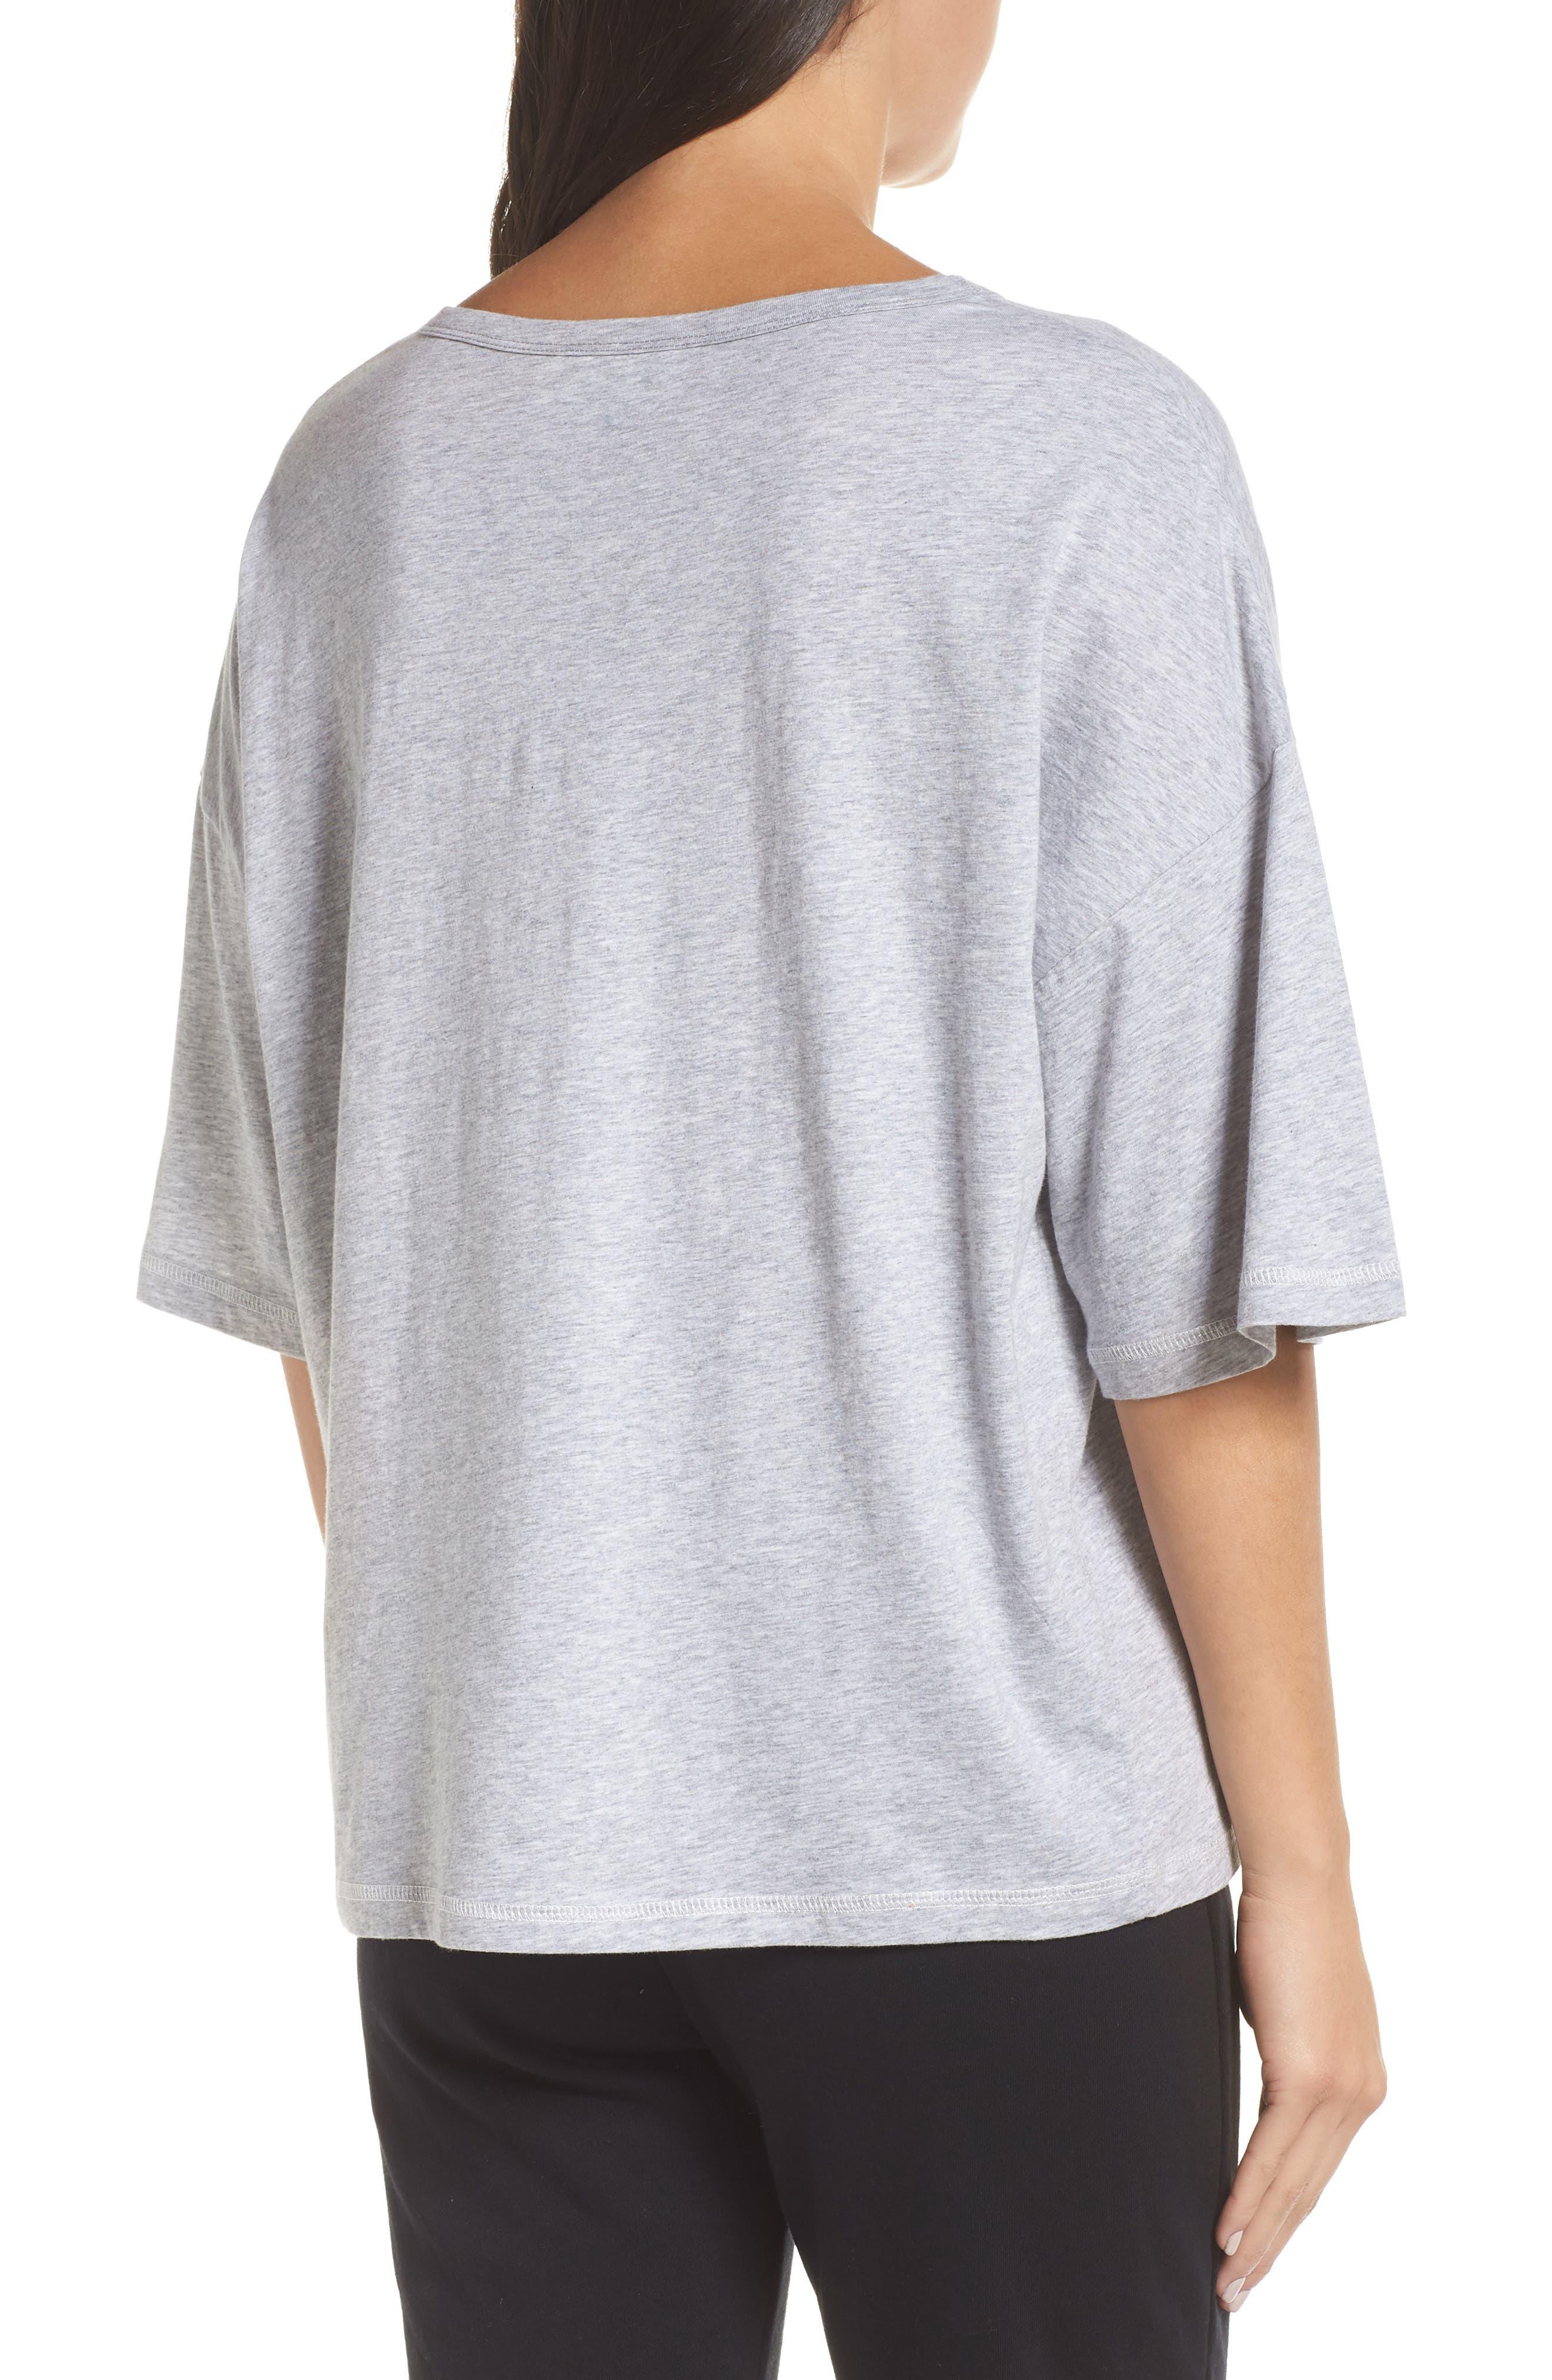 Soph Lounge Shirt,                             Alternate thumbnail 2, color,                             SMOKE MARLE